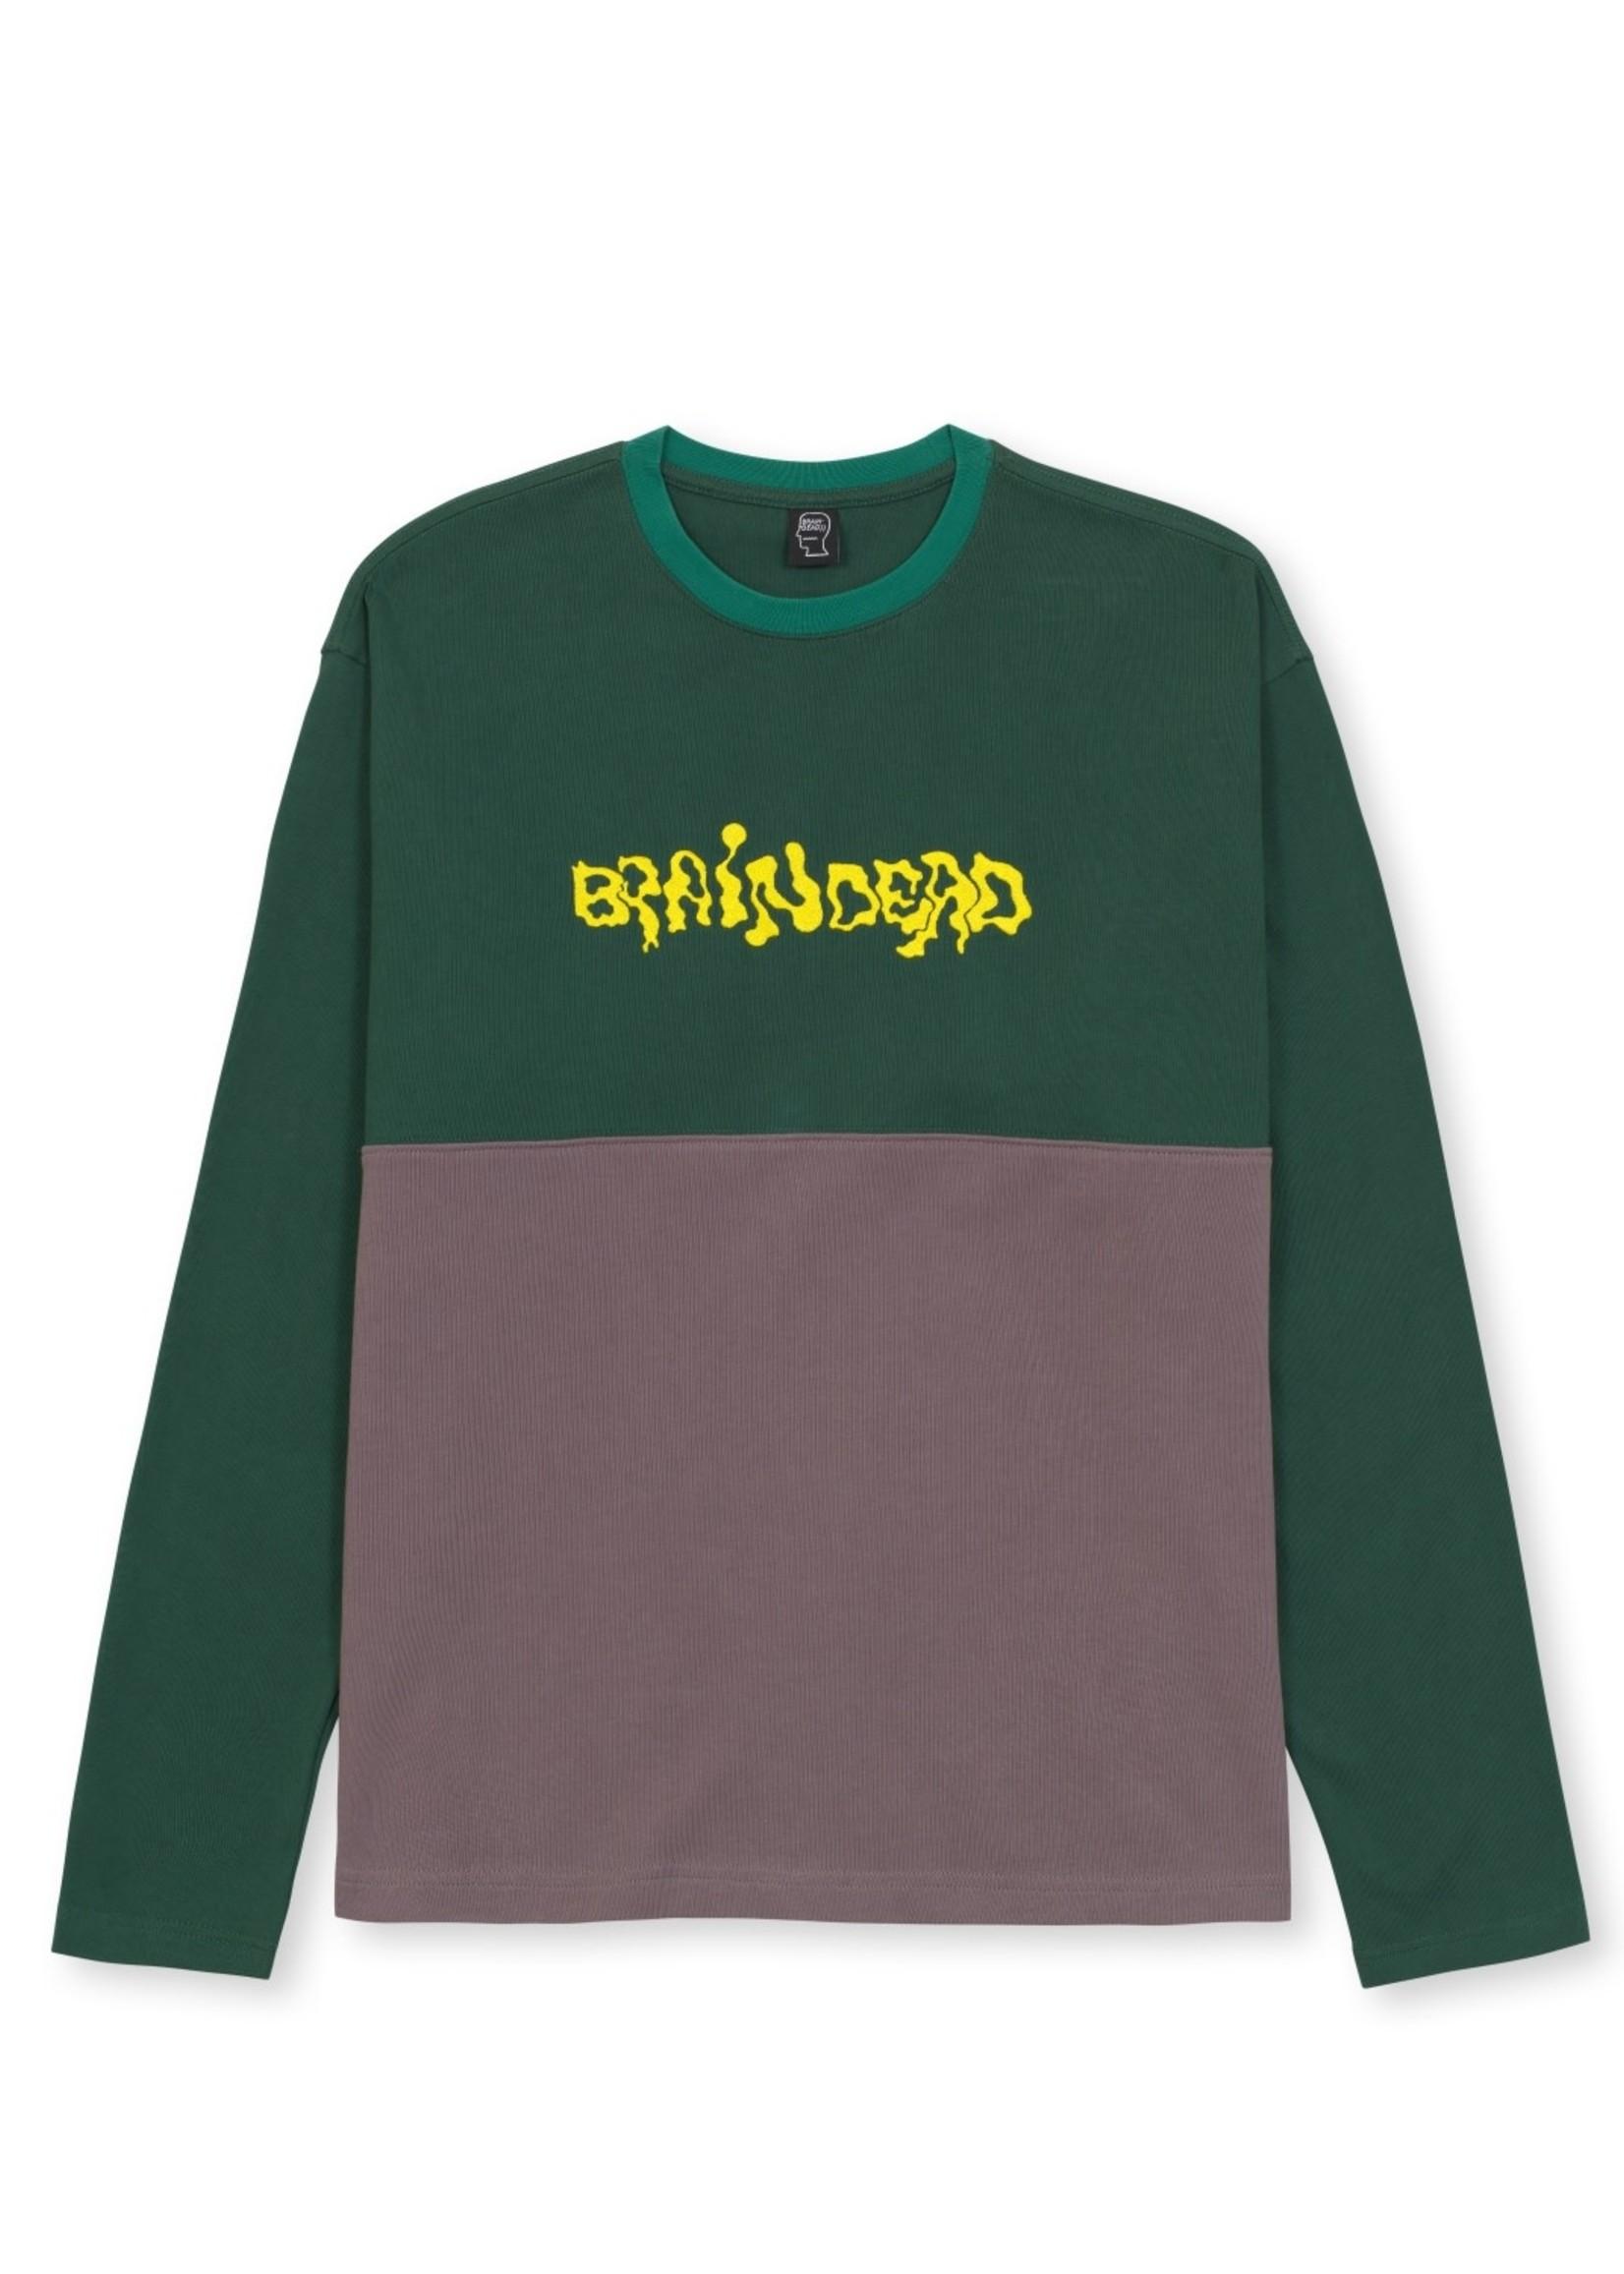 Brain Dead Embroidered Logo Football Shirt in Green